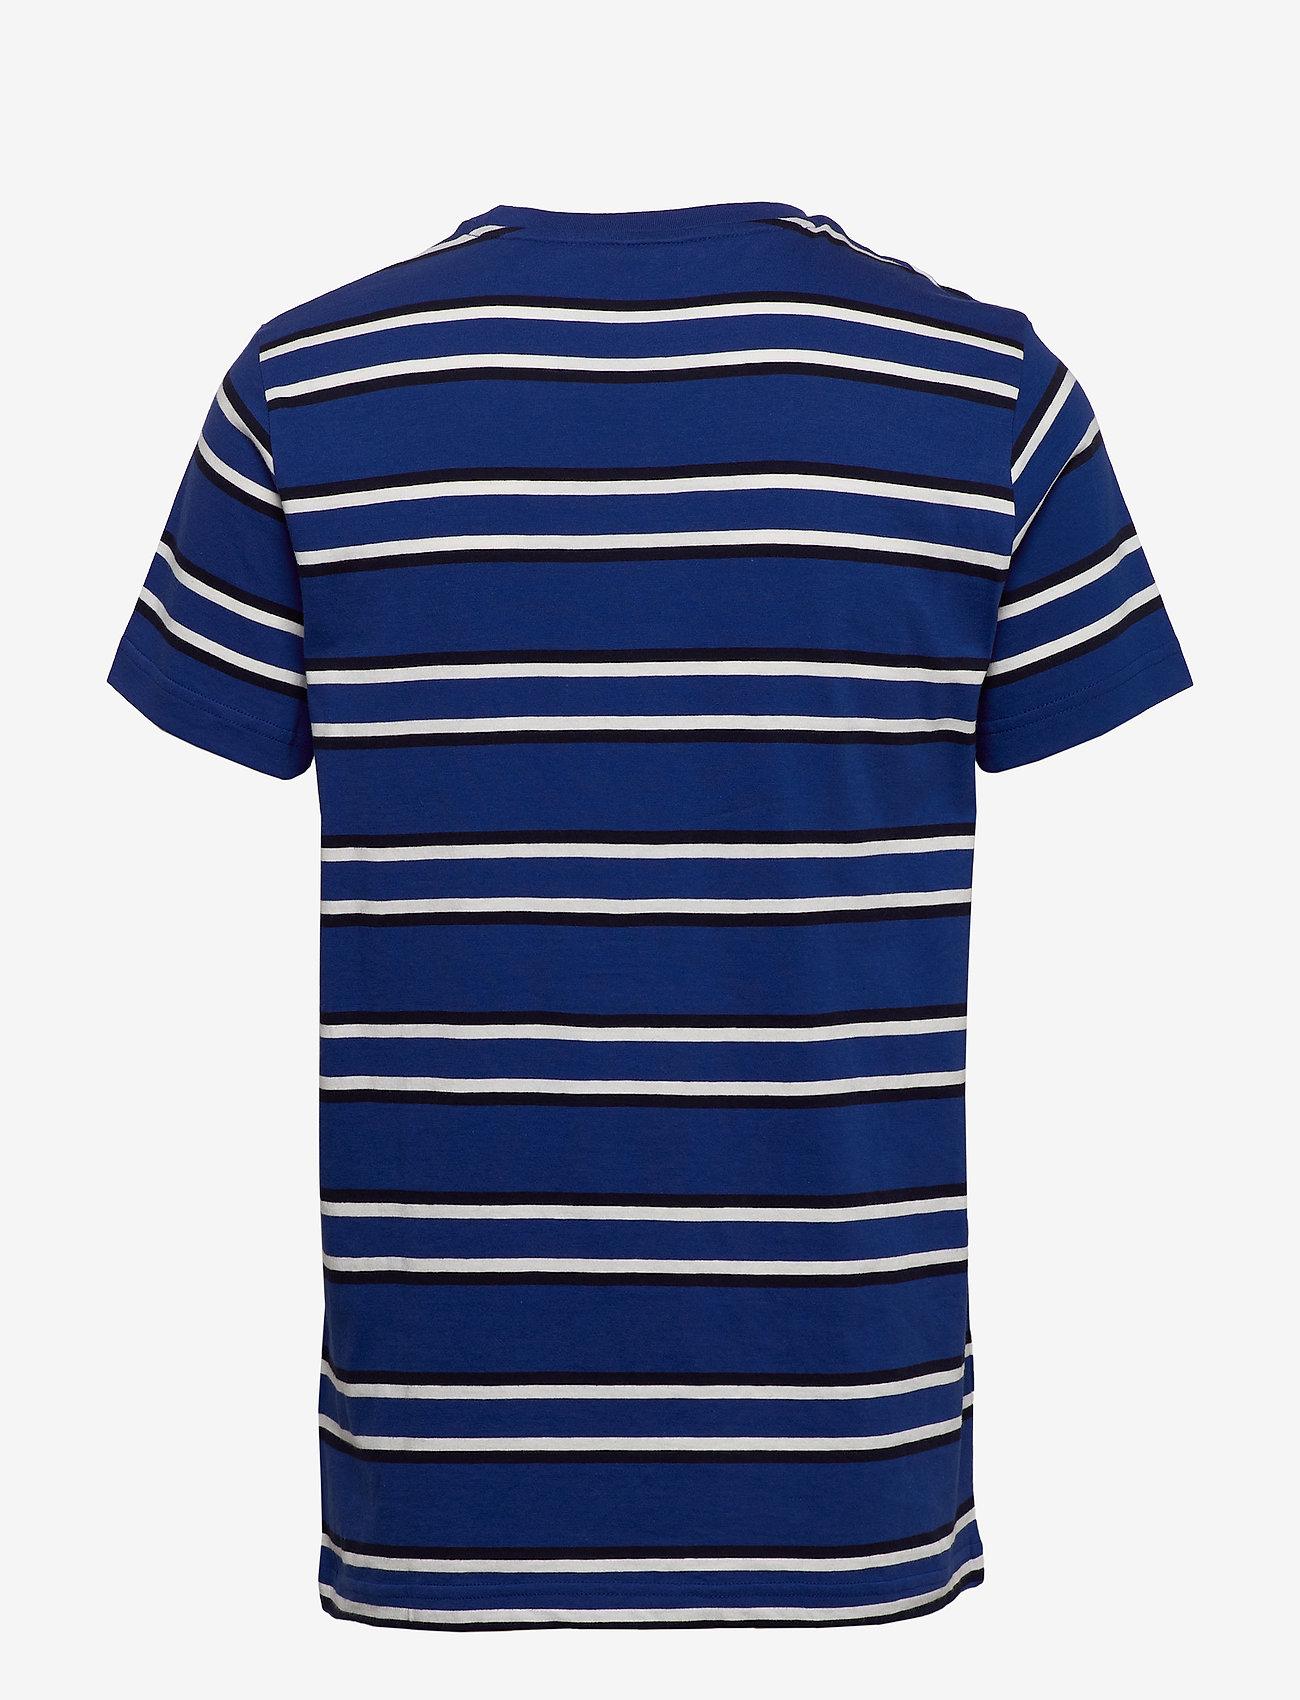 GANT - D1. MULTI STRIPE SS T-SHIRT - short-sleeved t-shirts - crisp blue - 1